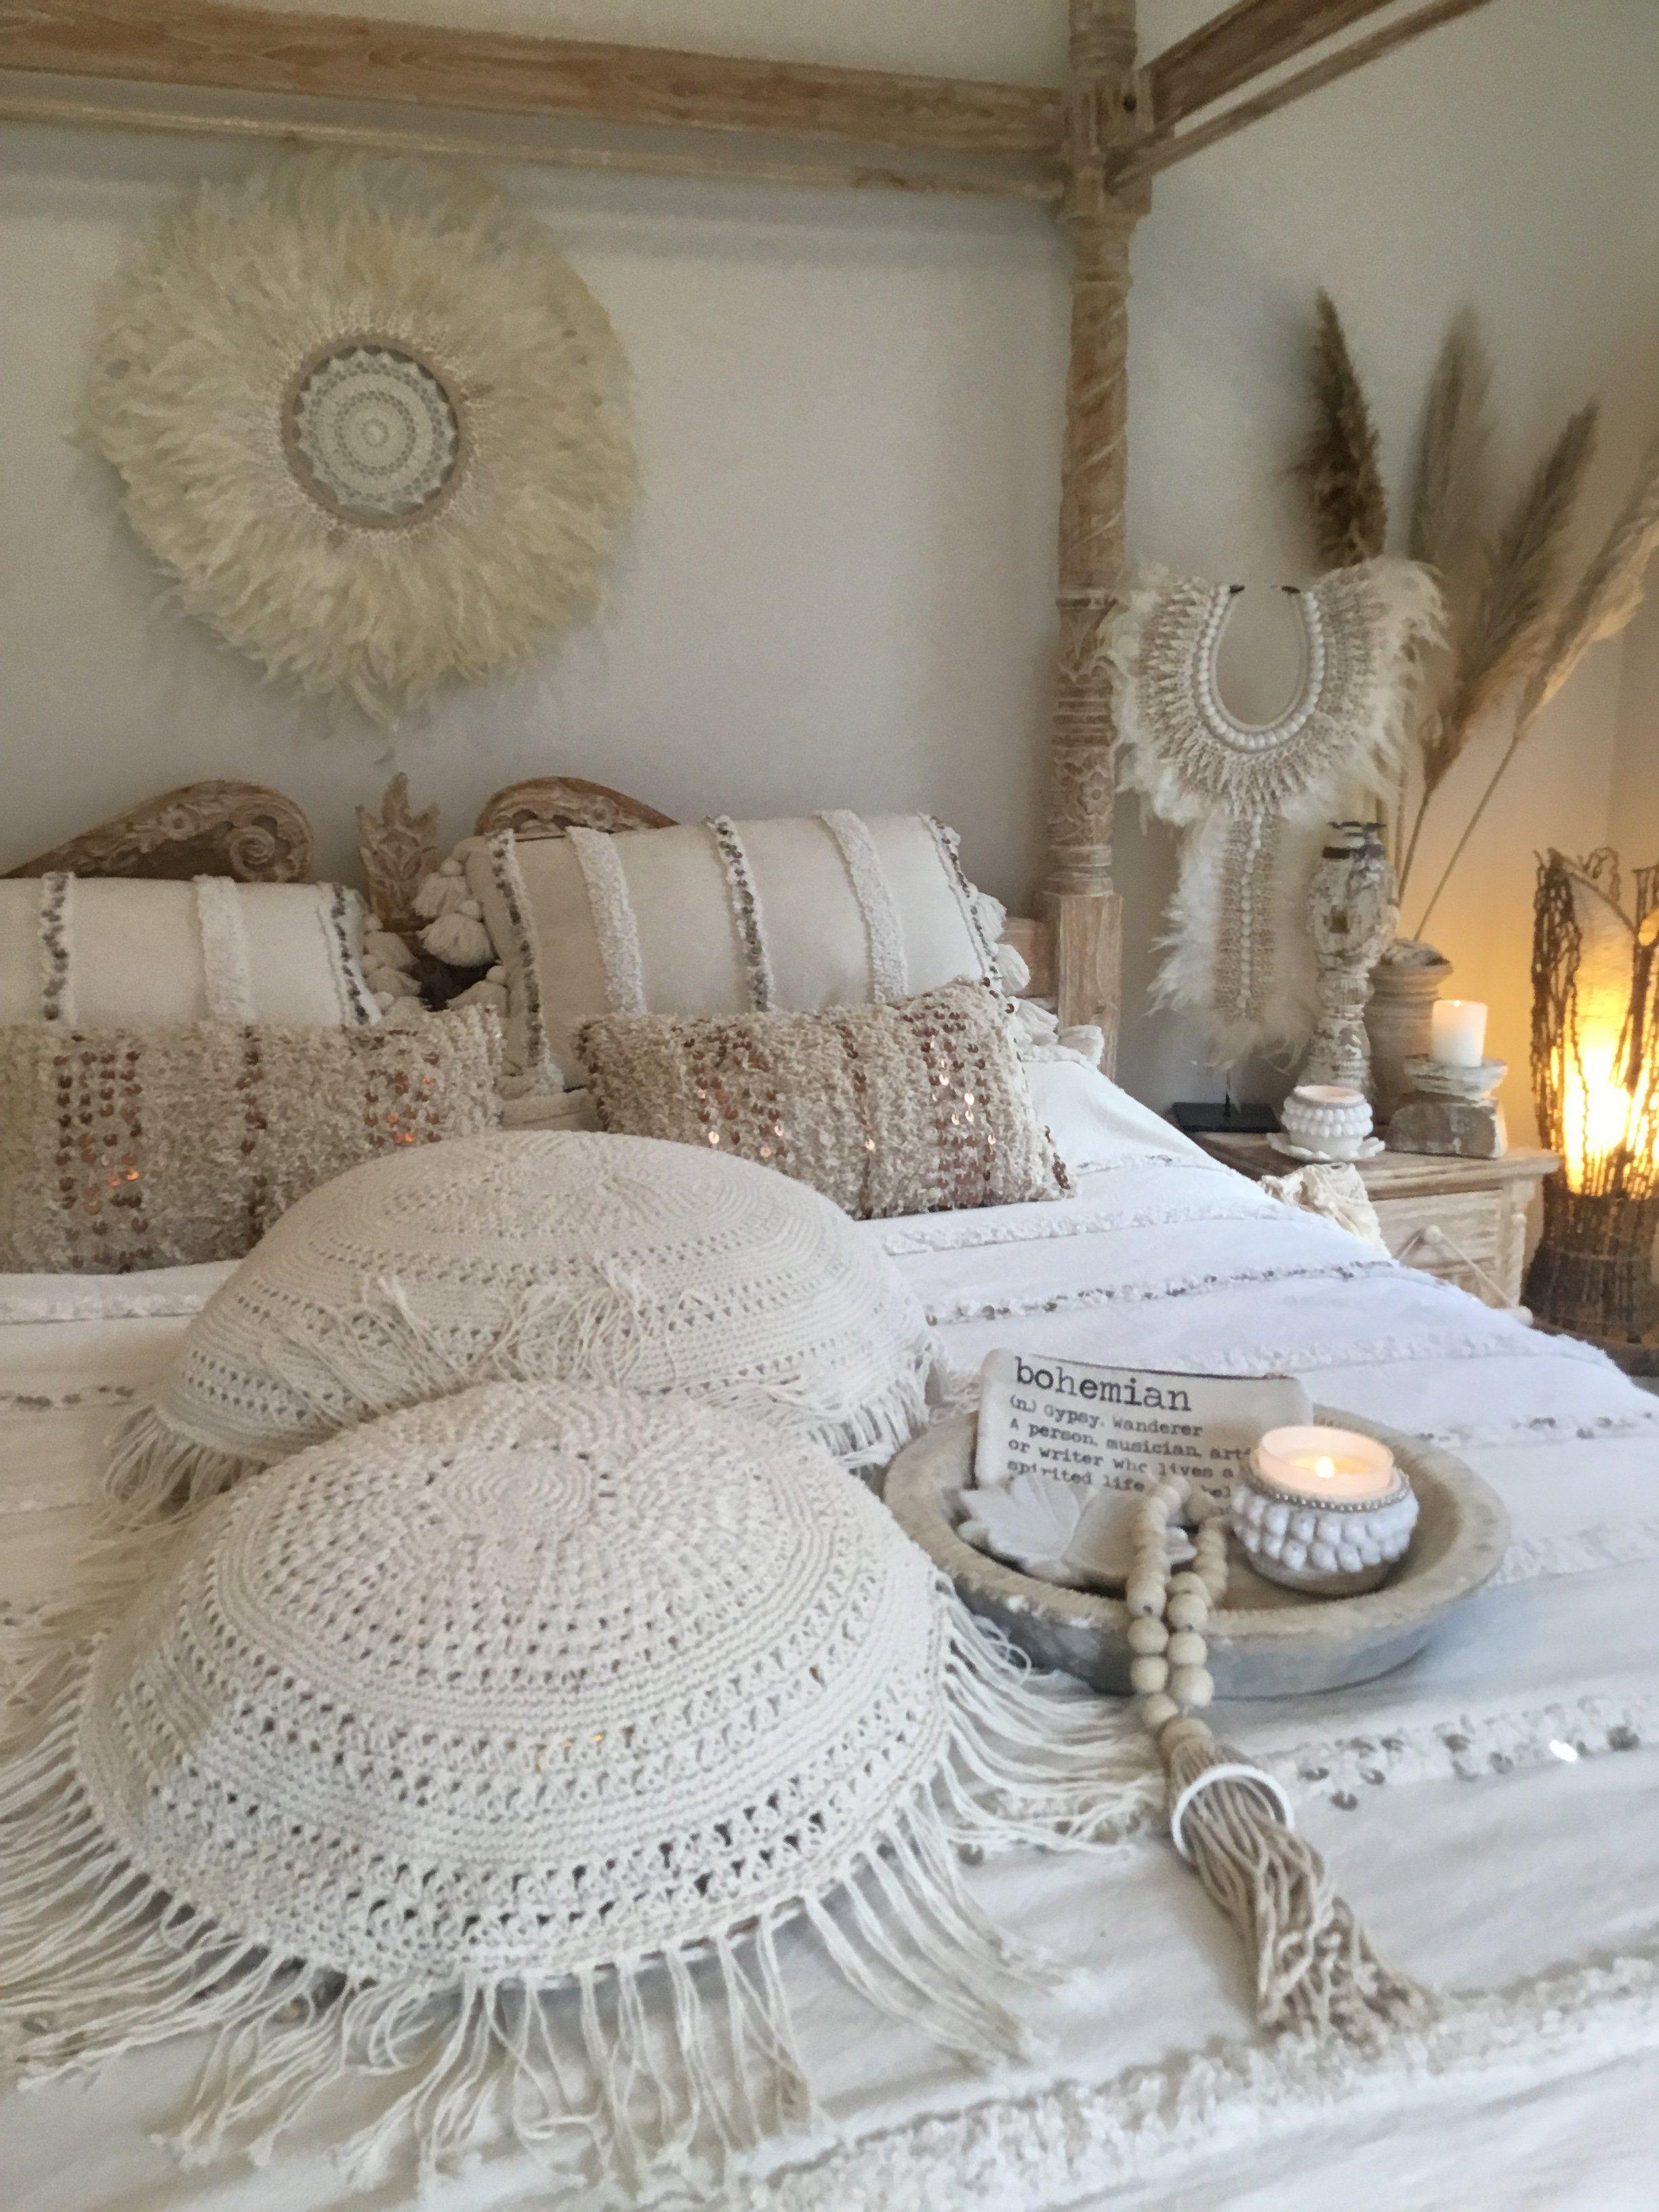 Tropical Interiors Tropical Tribal Coastal Boho Home Decor Accessories Interior Styling